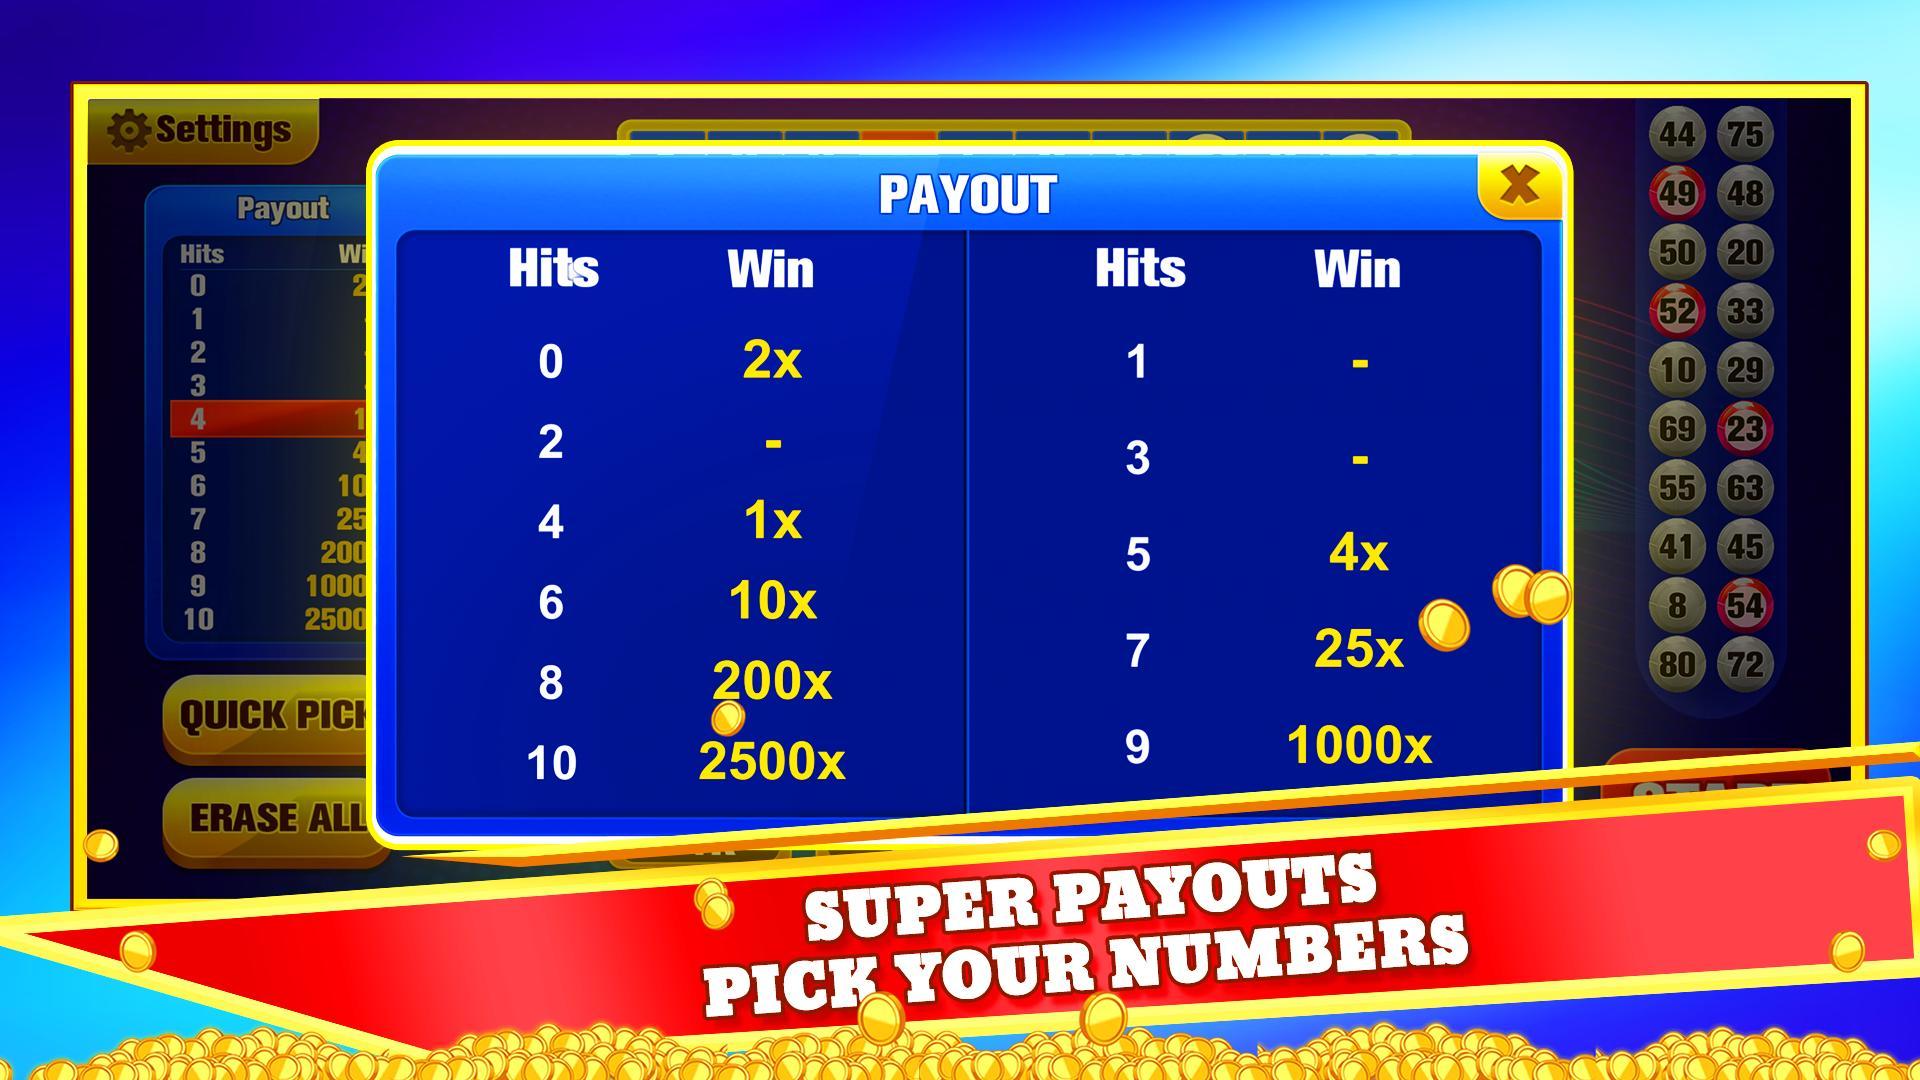 Classic video poker jackpot 45437